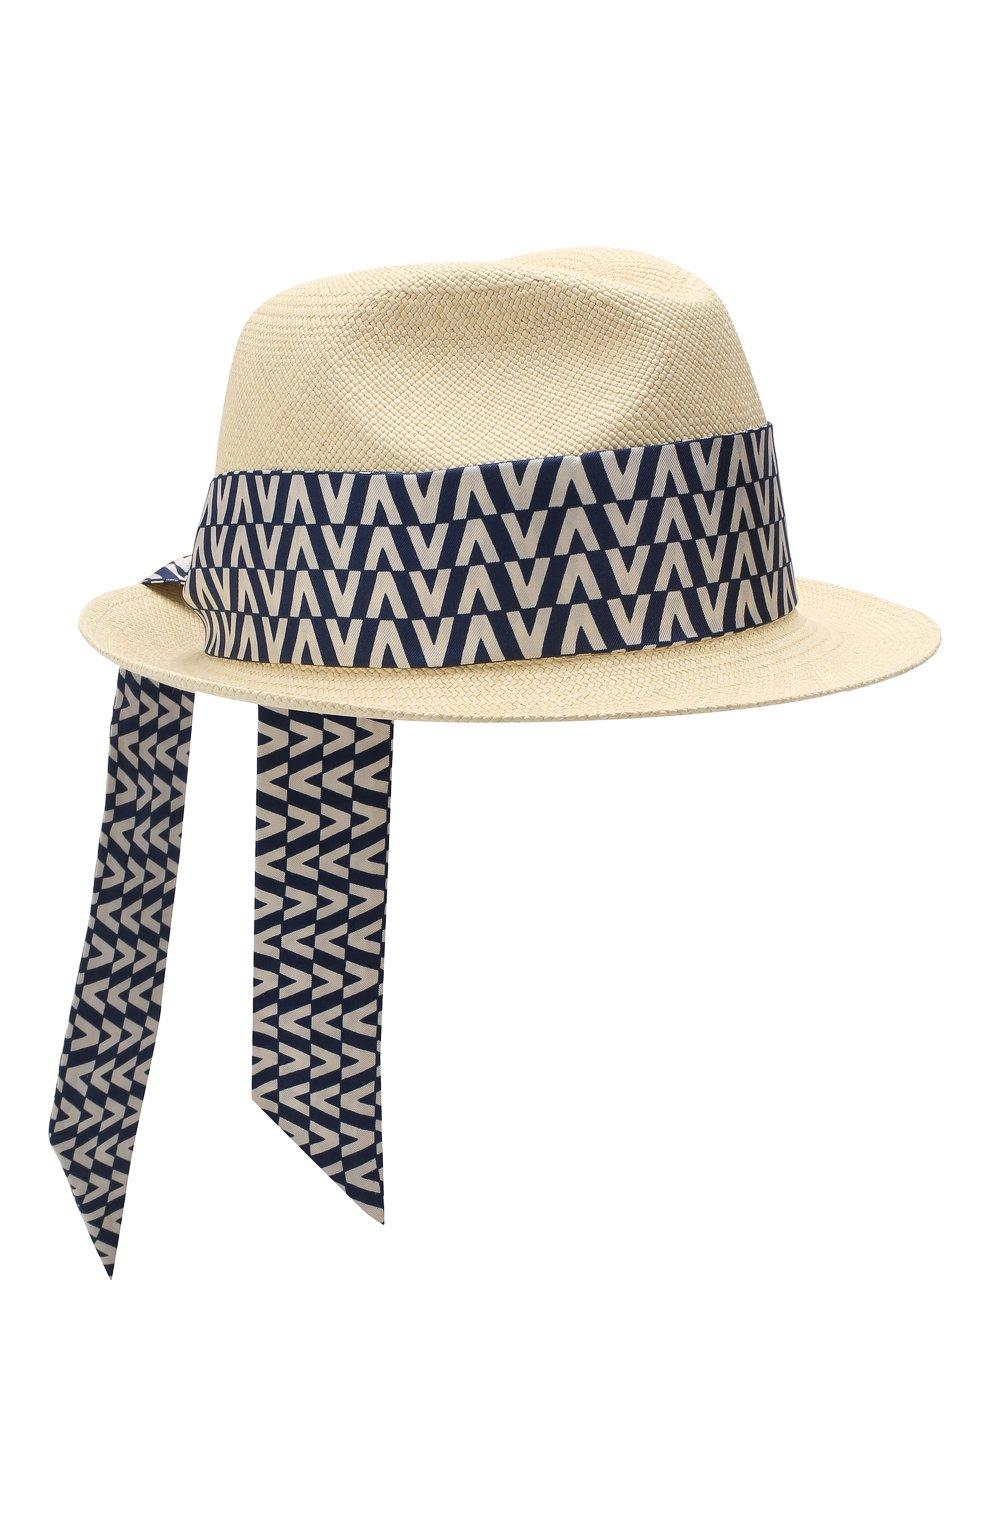 8a8a176ea1a3 Соломенная шляпа Valentino Garavani